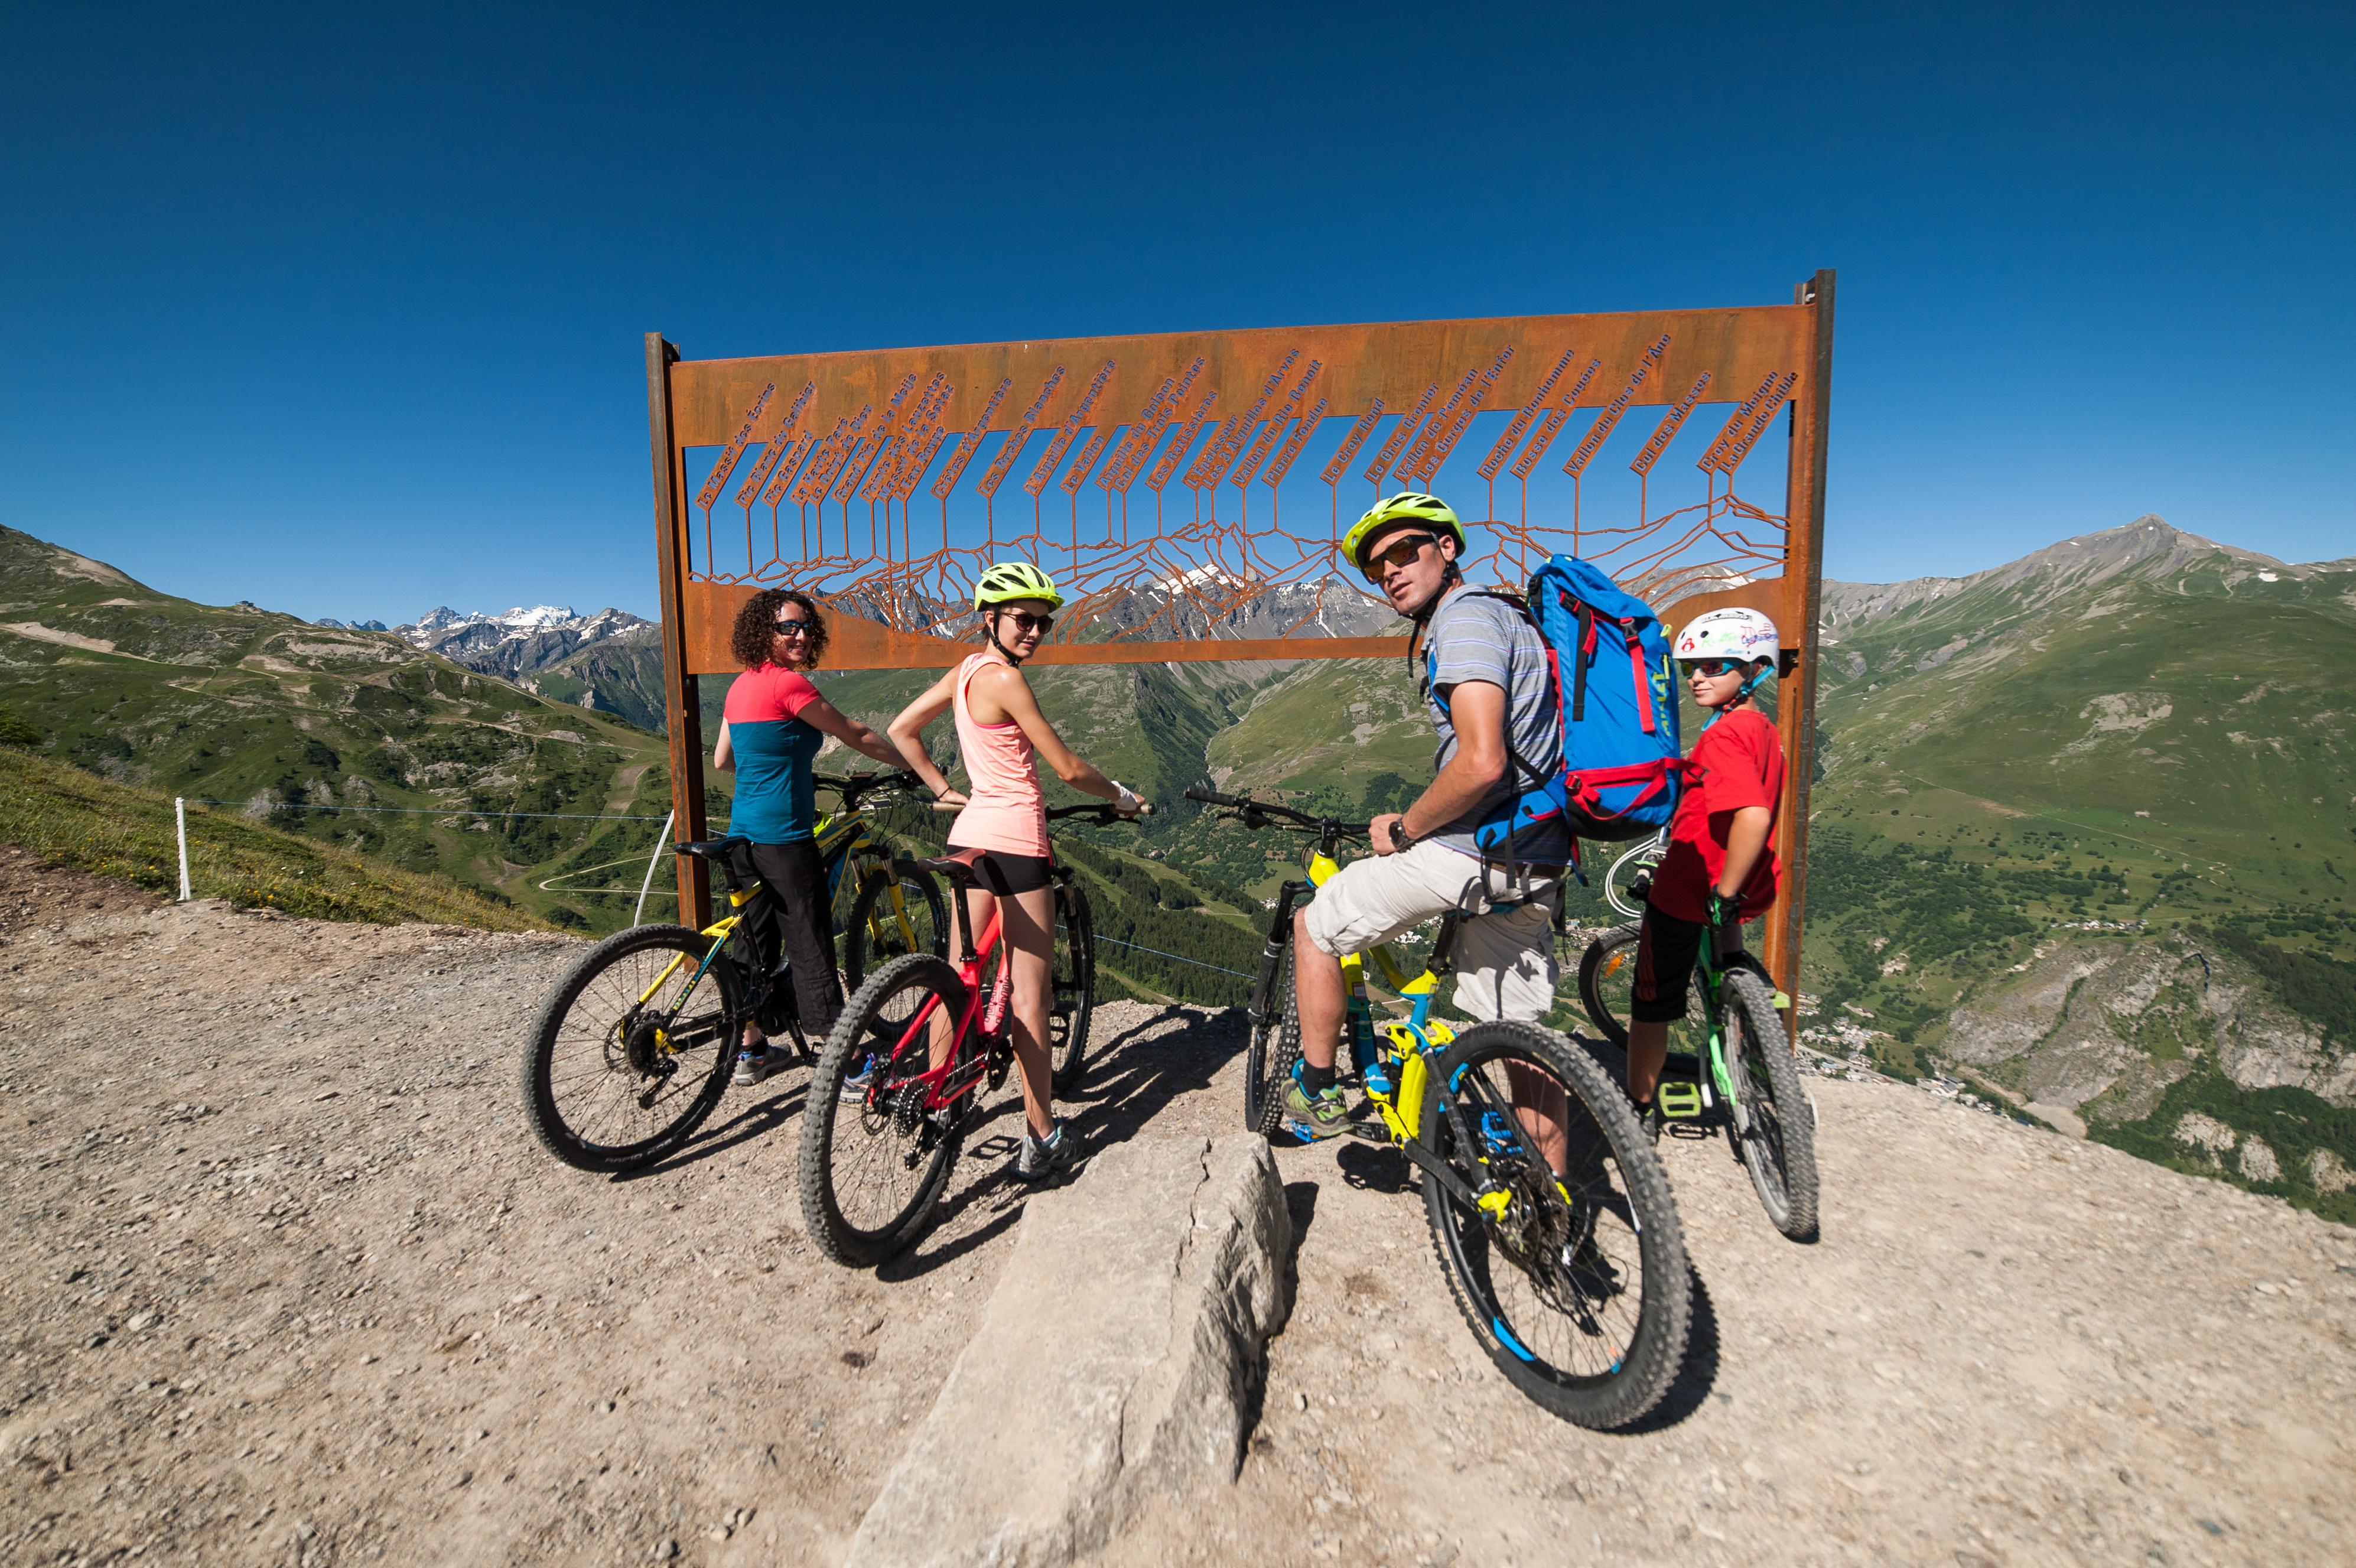 Bike Park Valloire © Alban Pernet / Valloire Tourisme